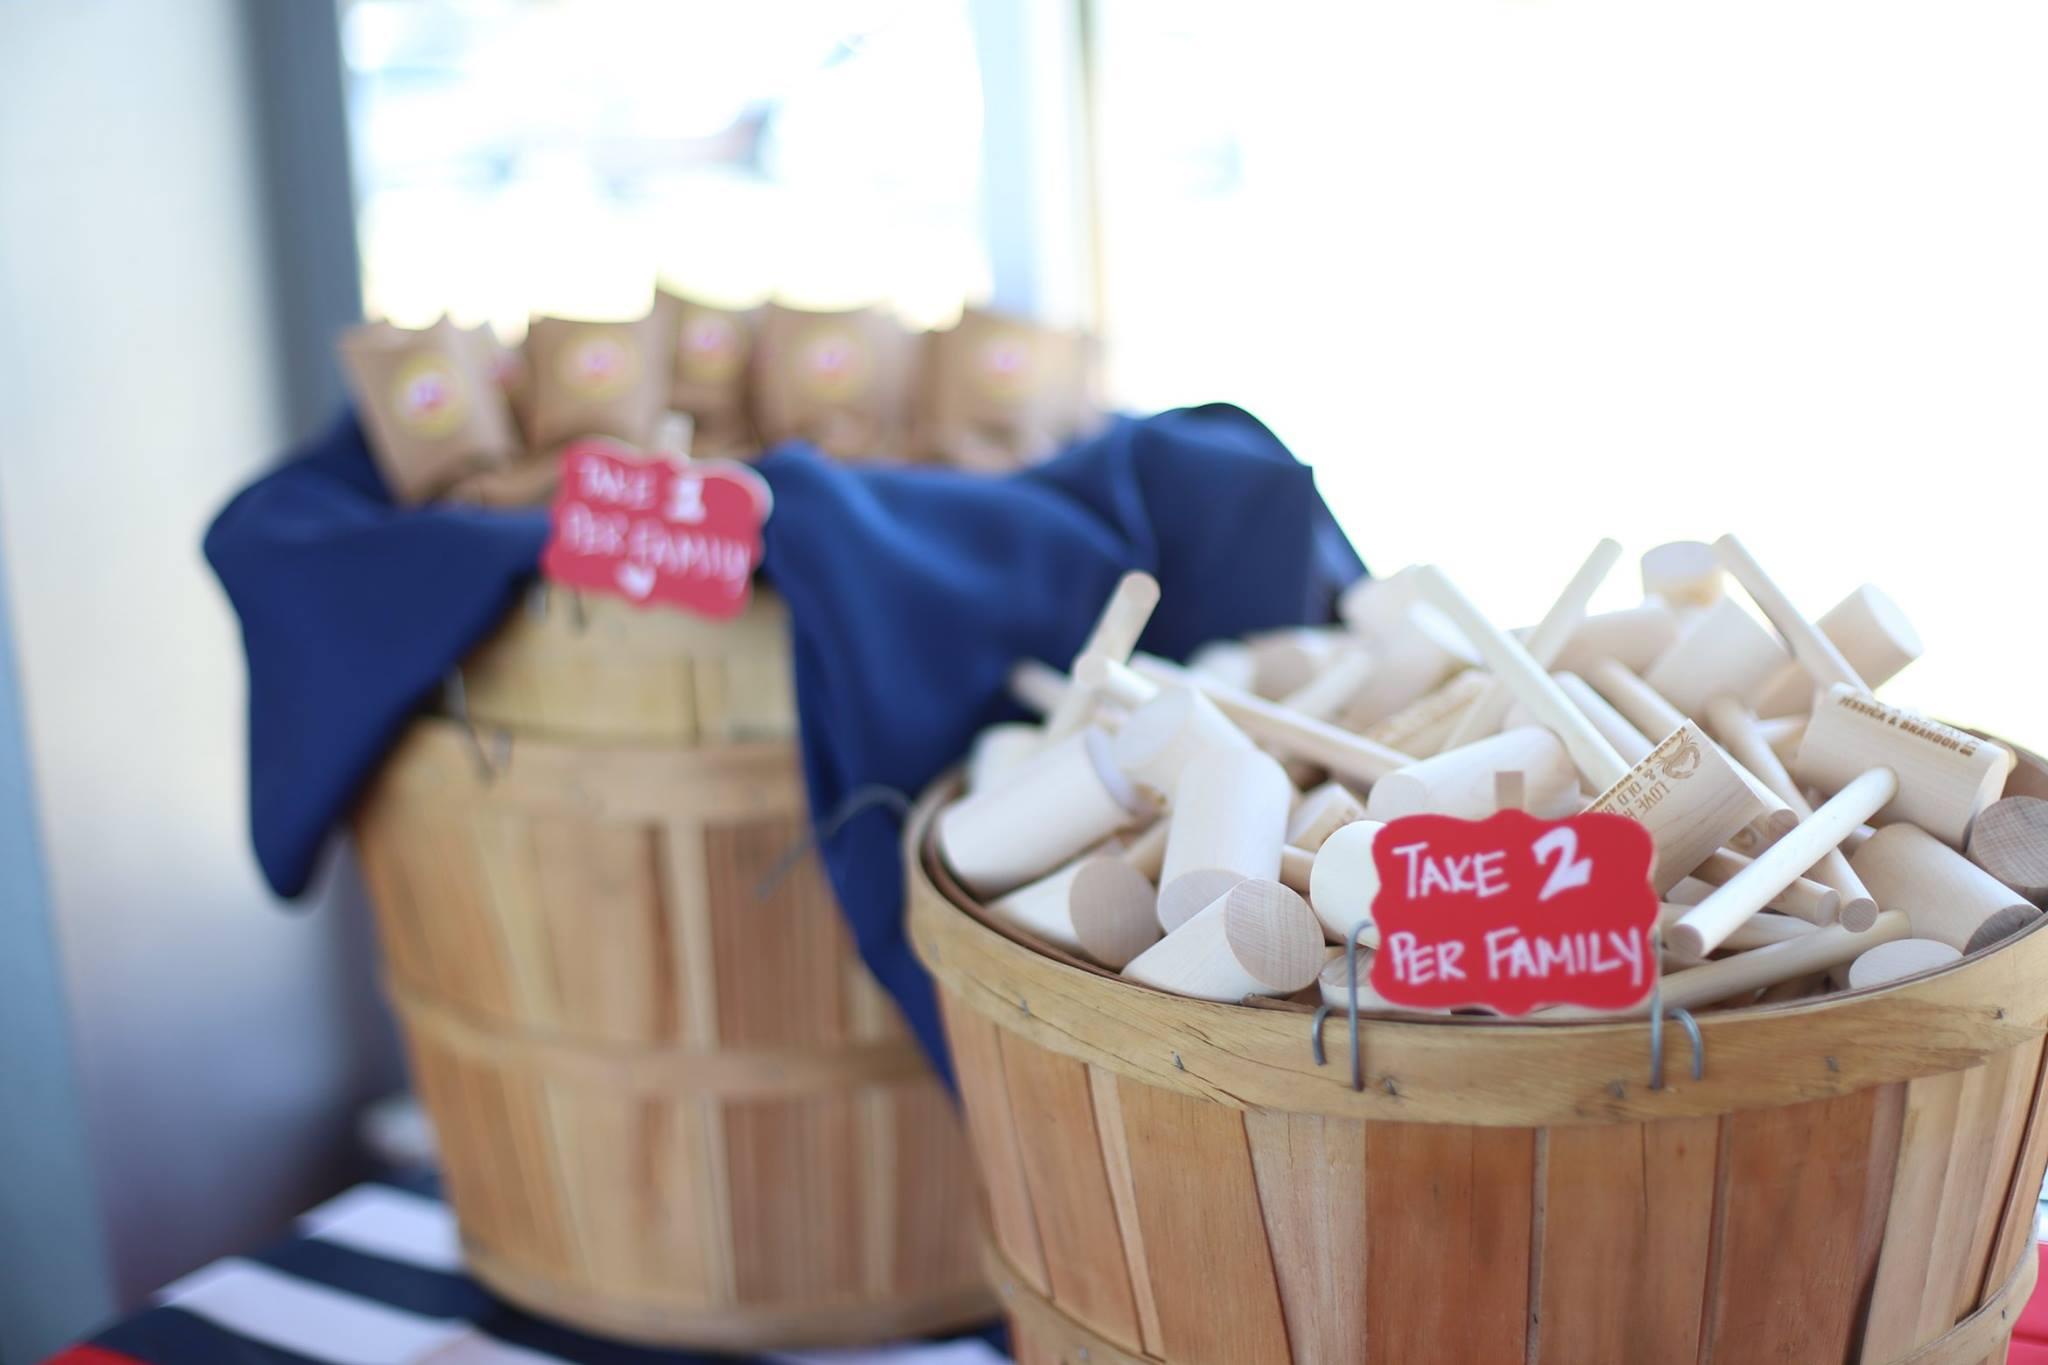 27_old_bay_wedding_decor_favors_tangled.jpg